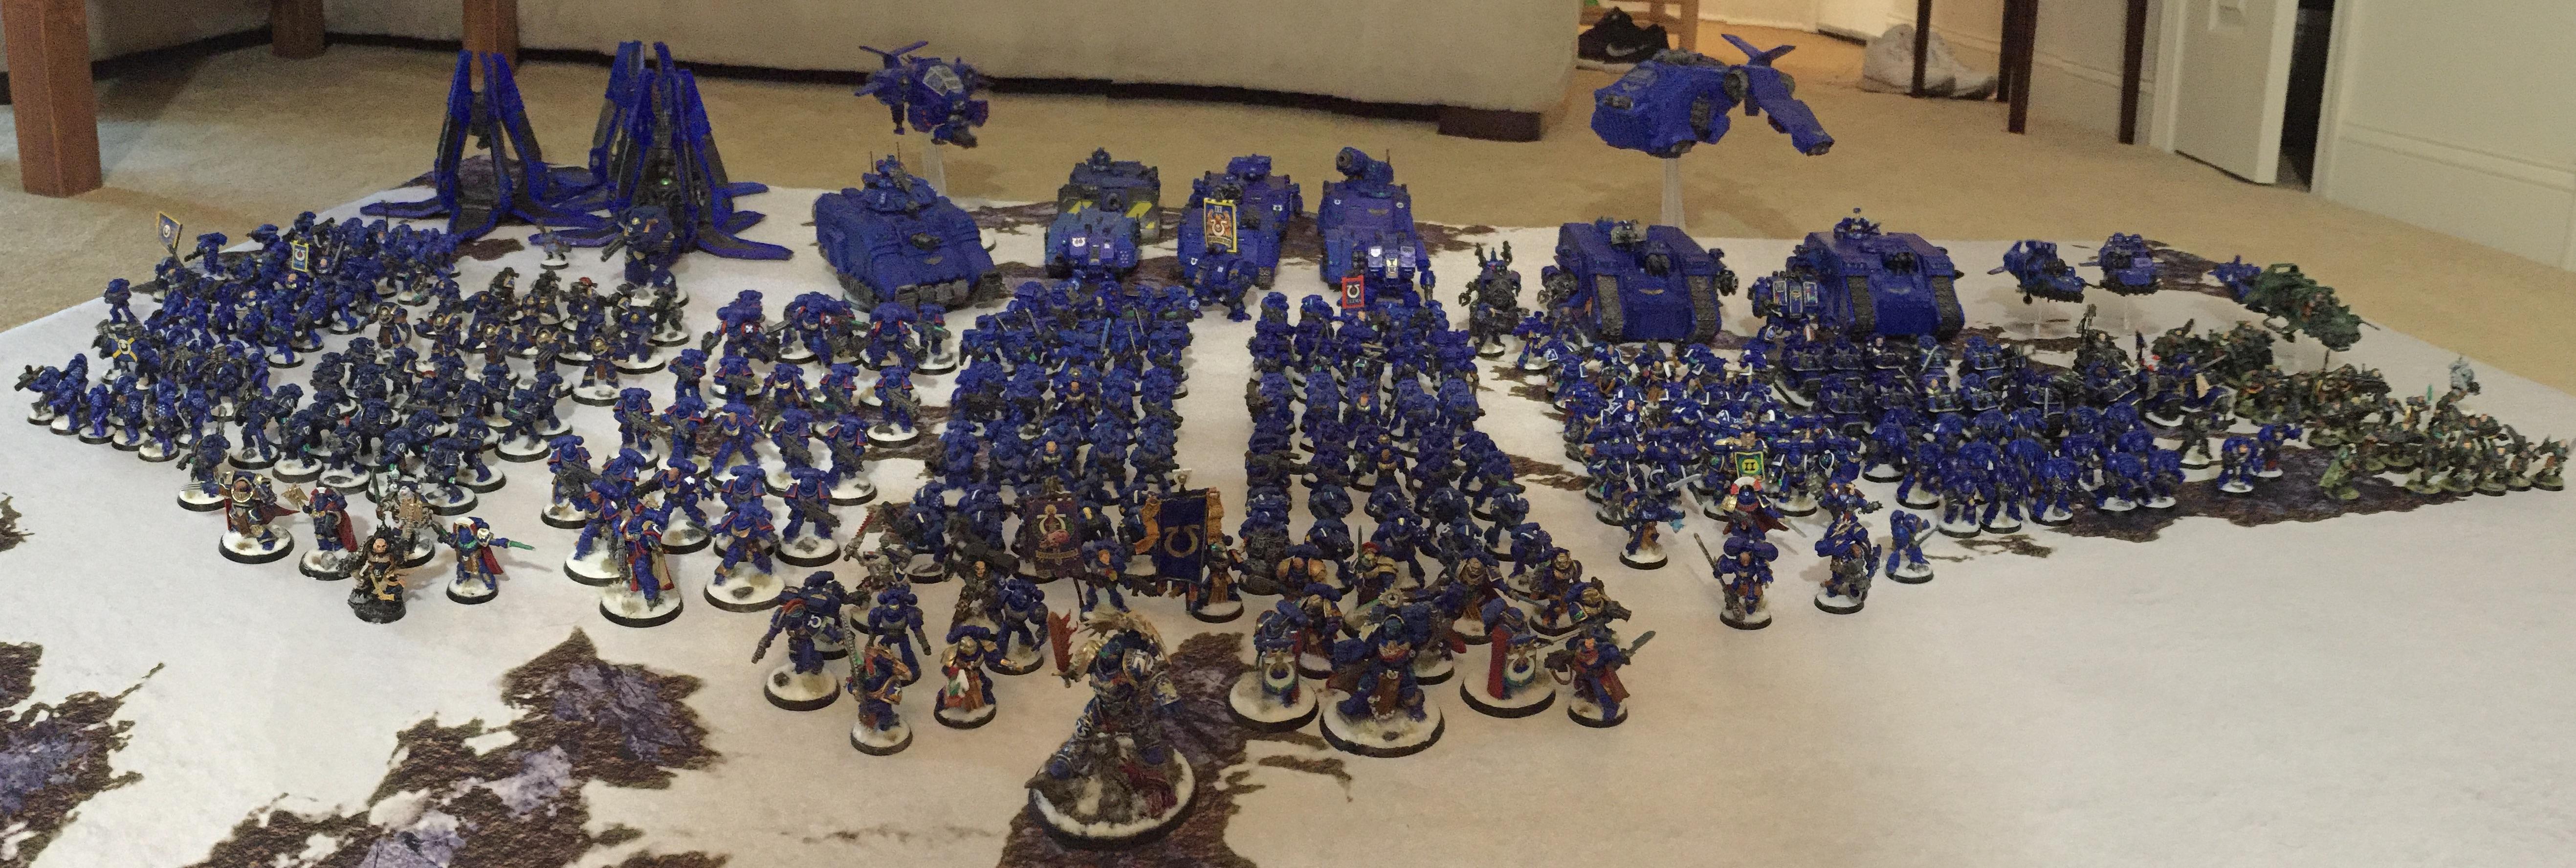 Army, Ultramarines, Warhammer 40,000